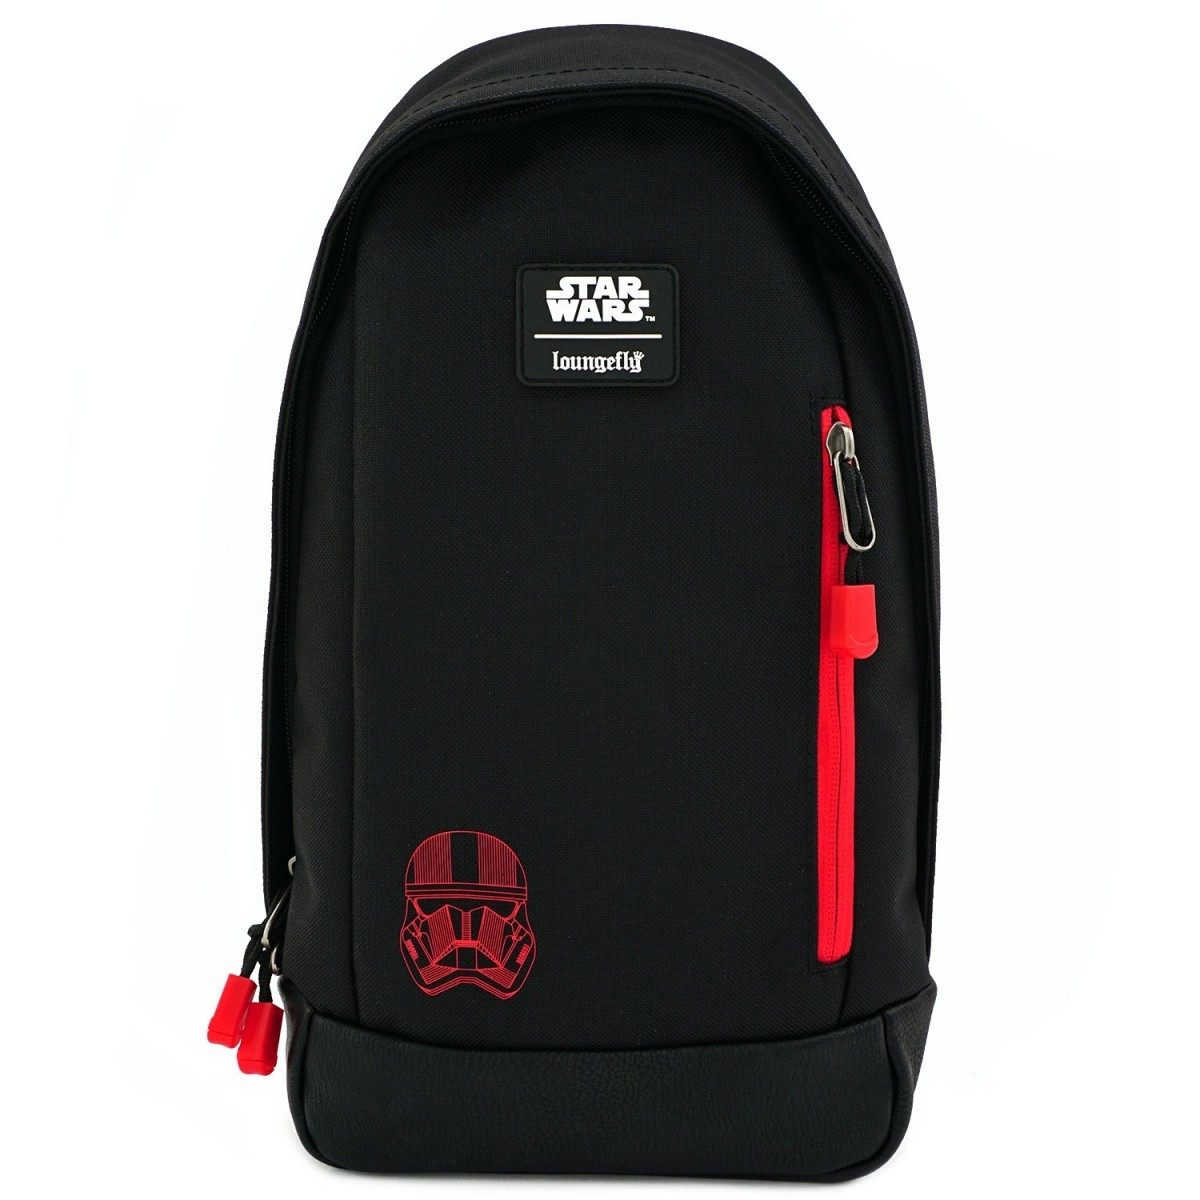 Loungefly: Star Wars - Sith Trooper Episode IX Rise of Skywalker Sling Backpack image